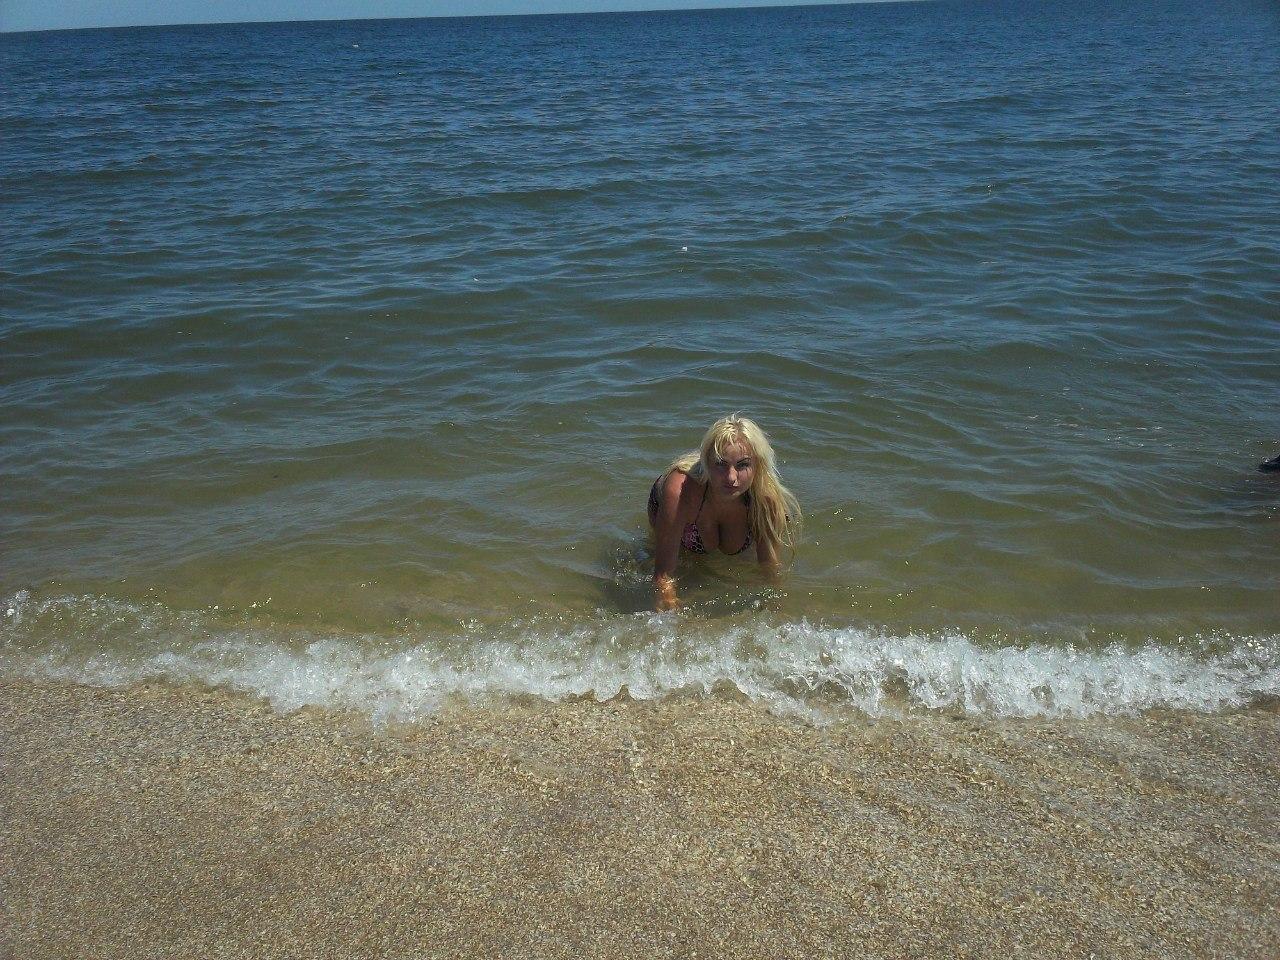 Азовское море. Бердянск. 2012 г. 5sFUuyZKSXw